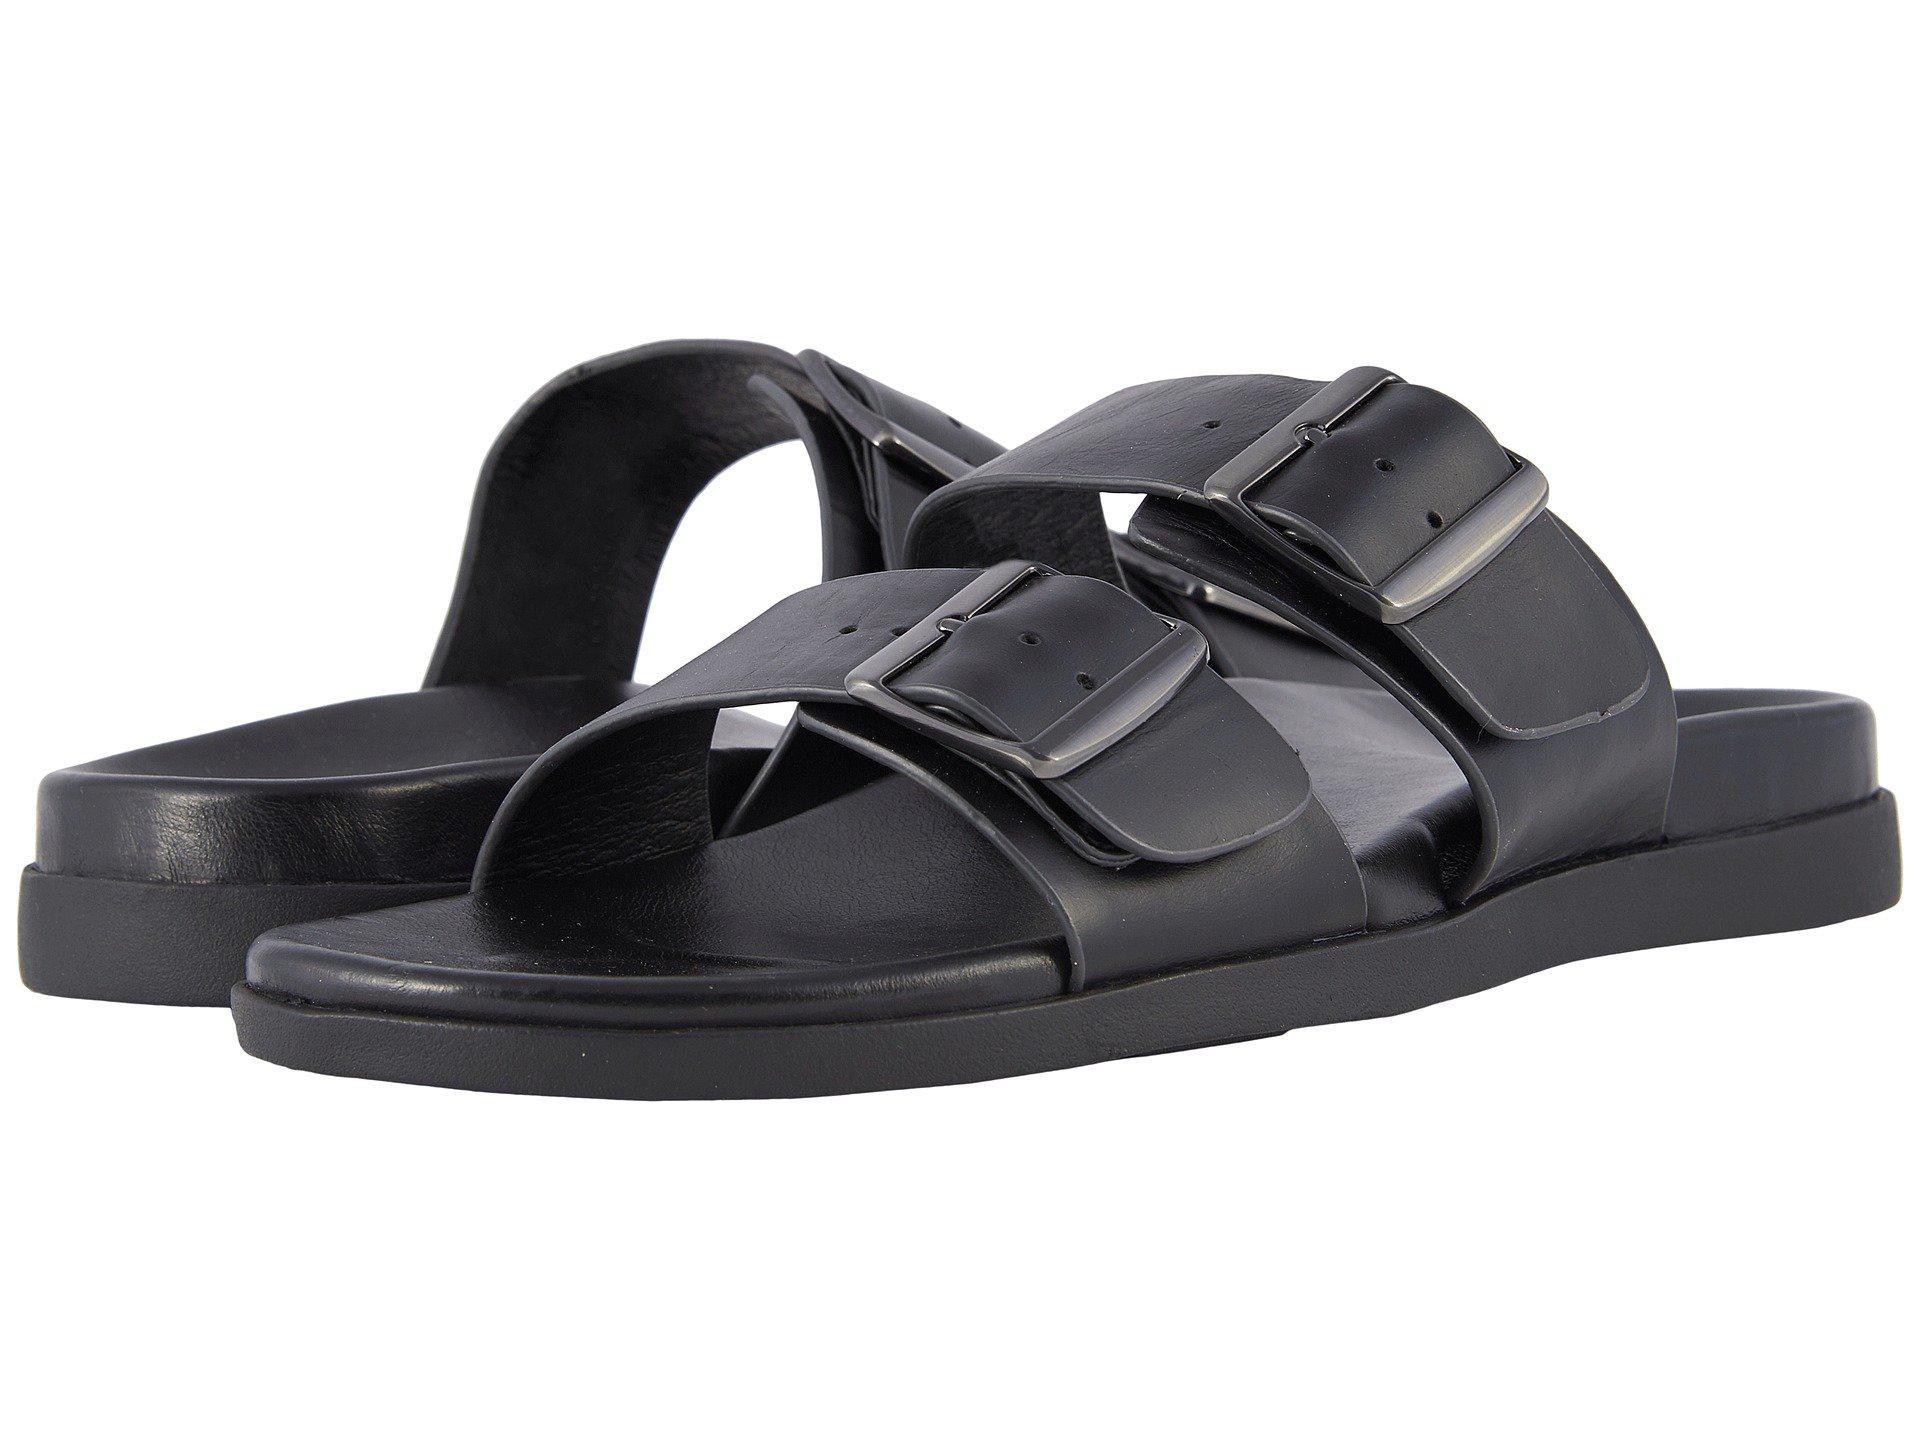 1dc9ba03a69e Lyst - Vionic Charlie (black) Men s Sandals in Black for Men